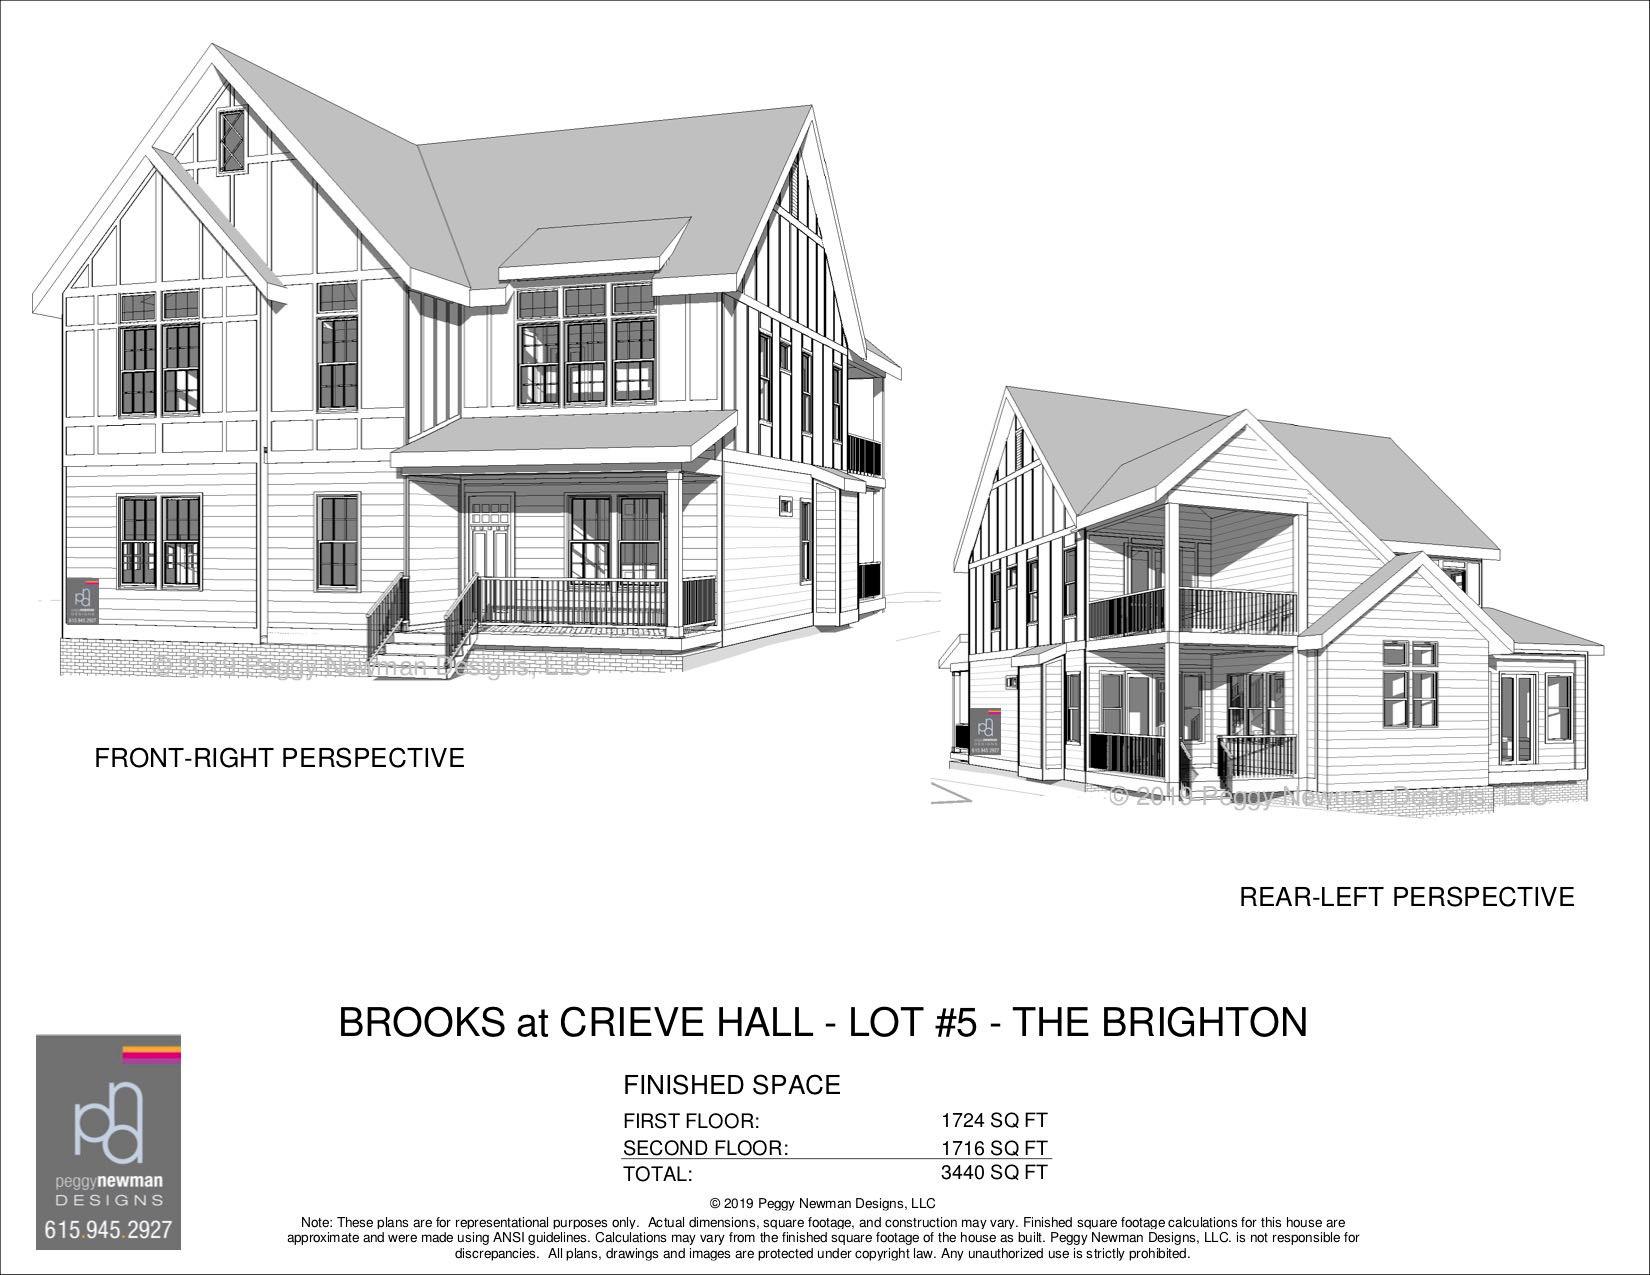 BRIGHTON - Brooks at Crieve Hall - Lot 5